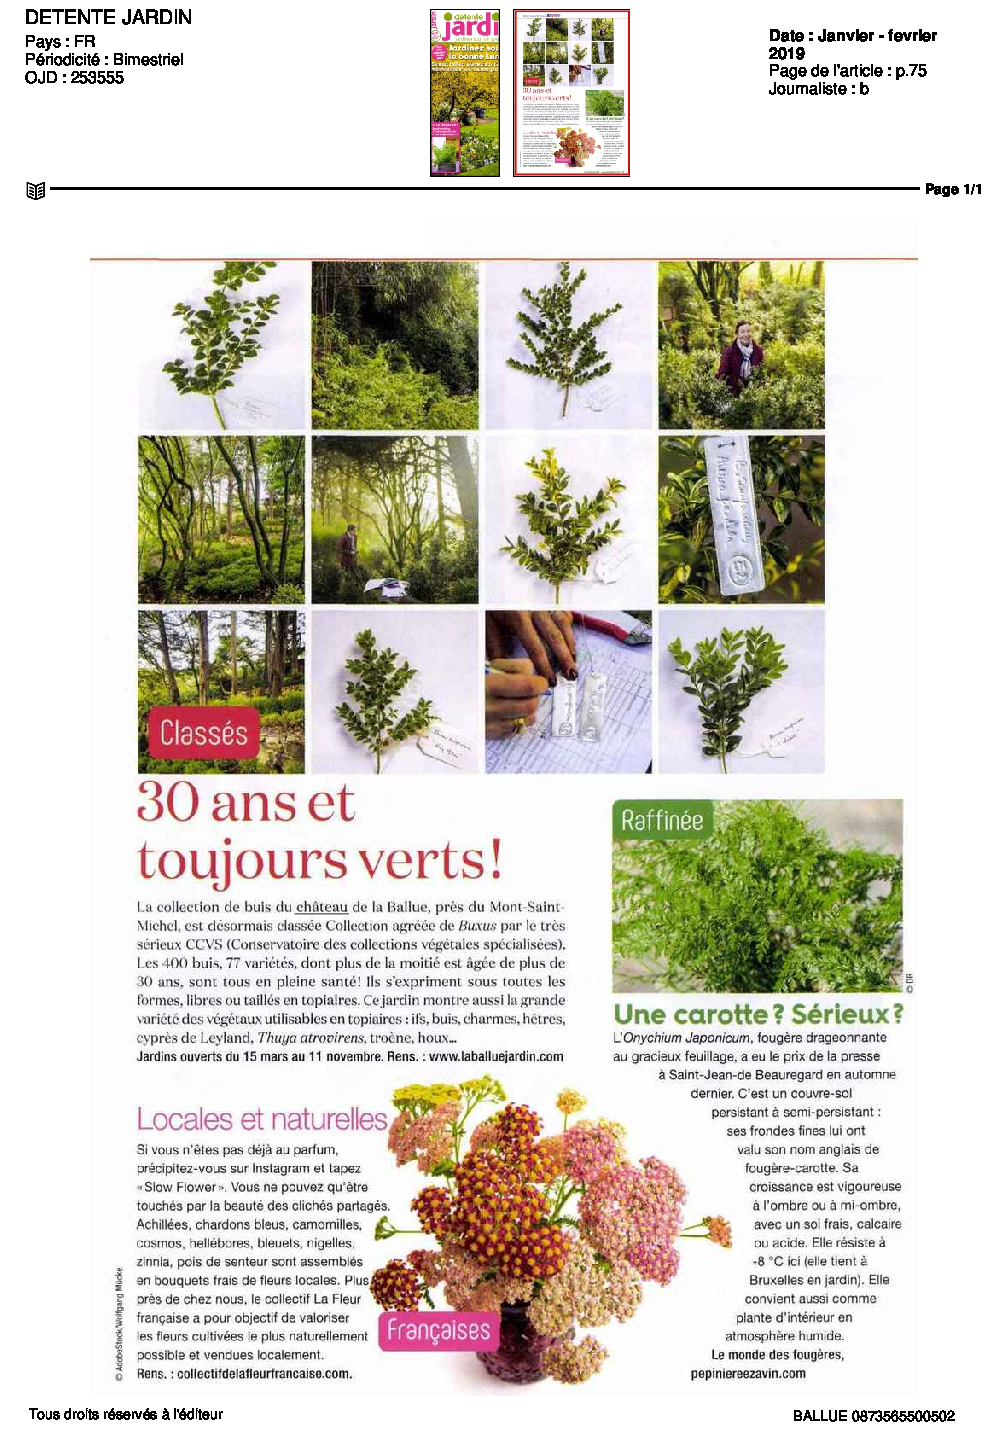 Détente Jardin Magazine-Janv-Fev-2019 - Les Jardins De La ... avec Détente Jardin Magazine